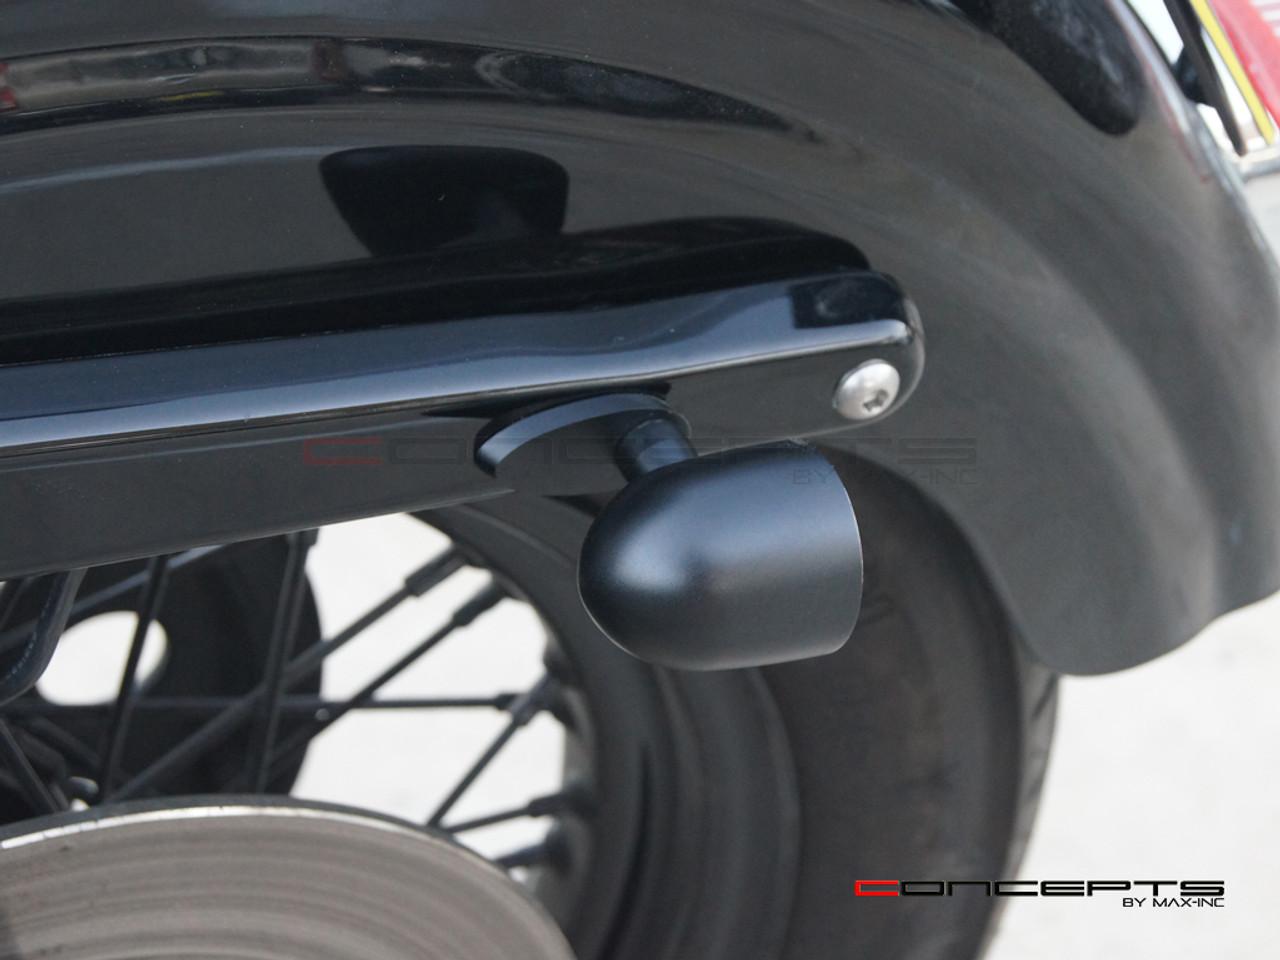 Harley Rear Rail Turn Signal Block Off Adapter Plates